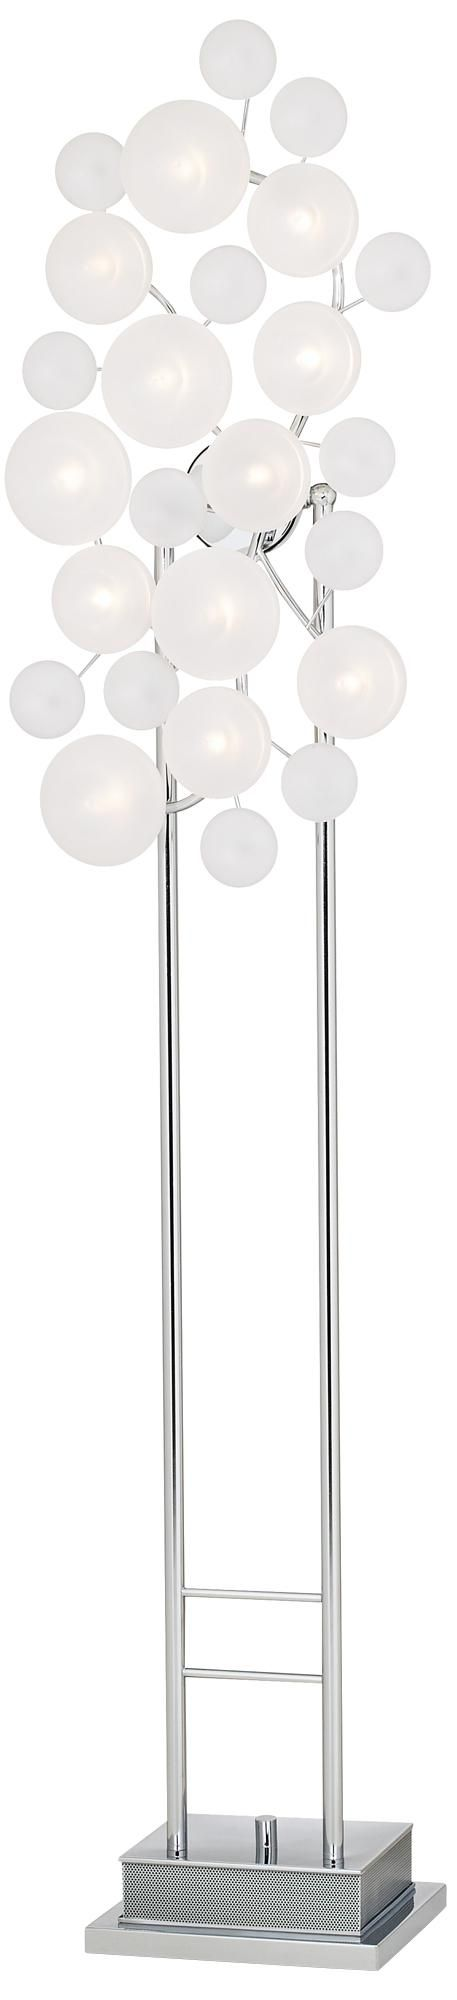 161 best lighting floor lamps images on pinterest chandeliers possini euro design etched glass lilypad floor lamp lampsplus aloadofball Images